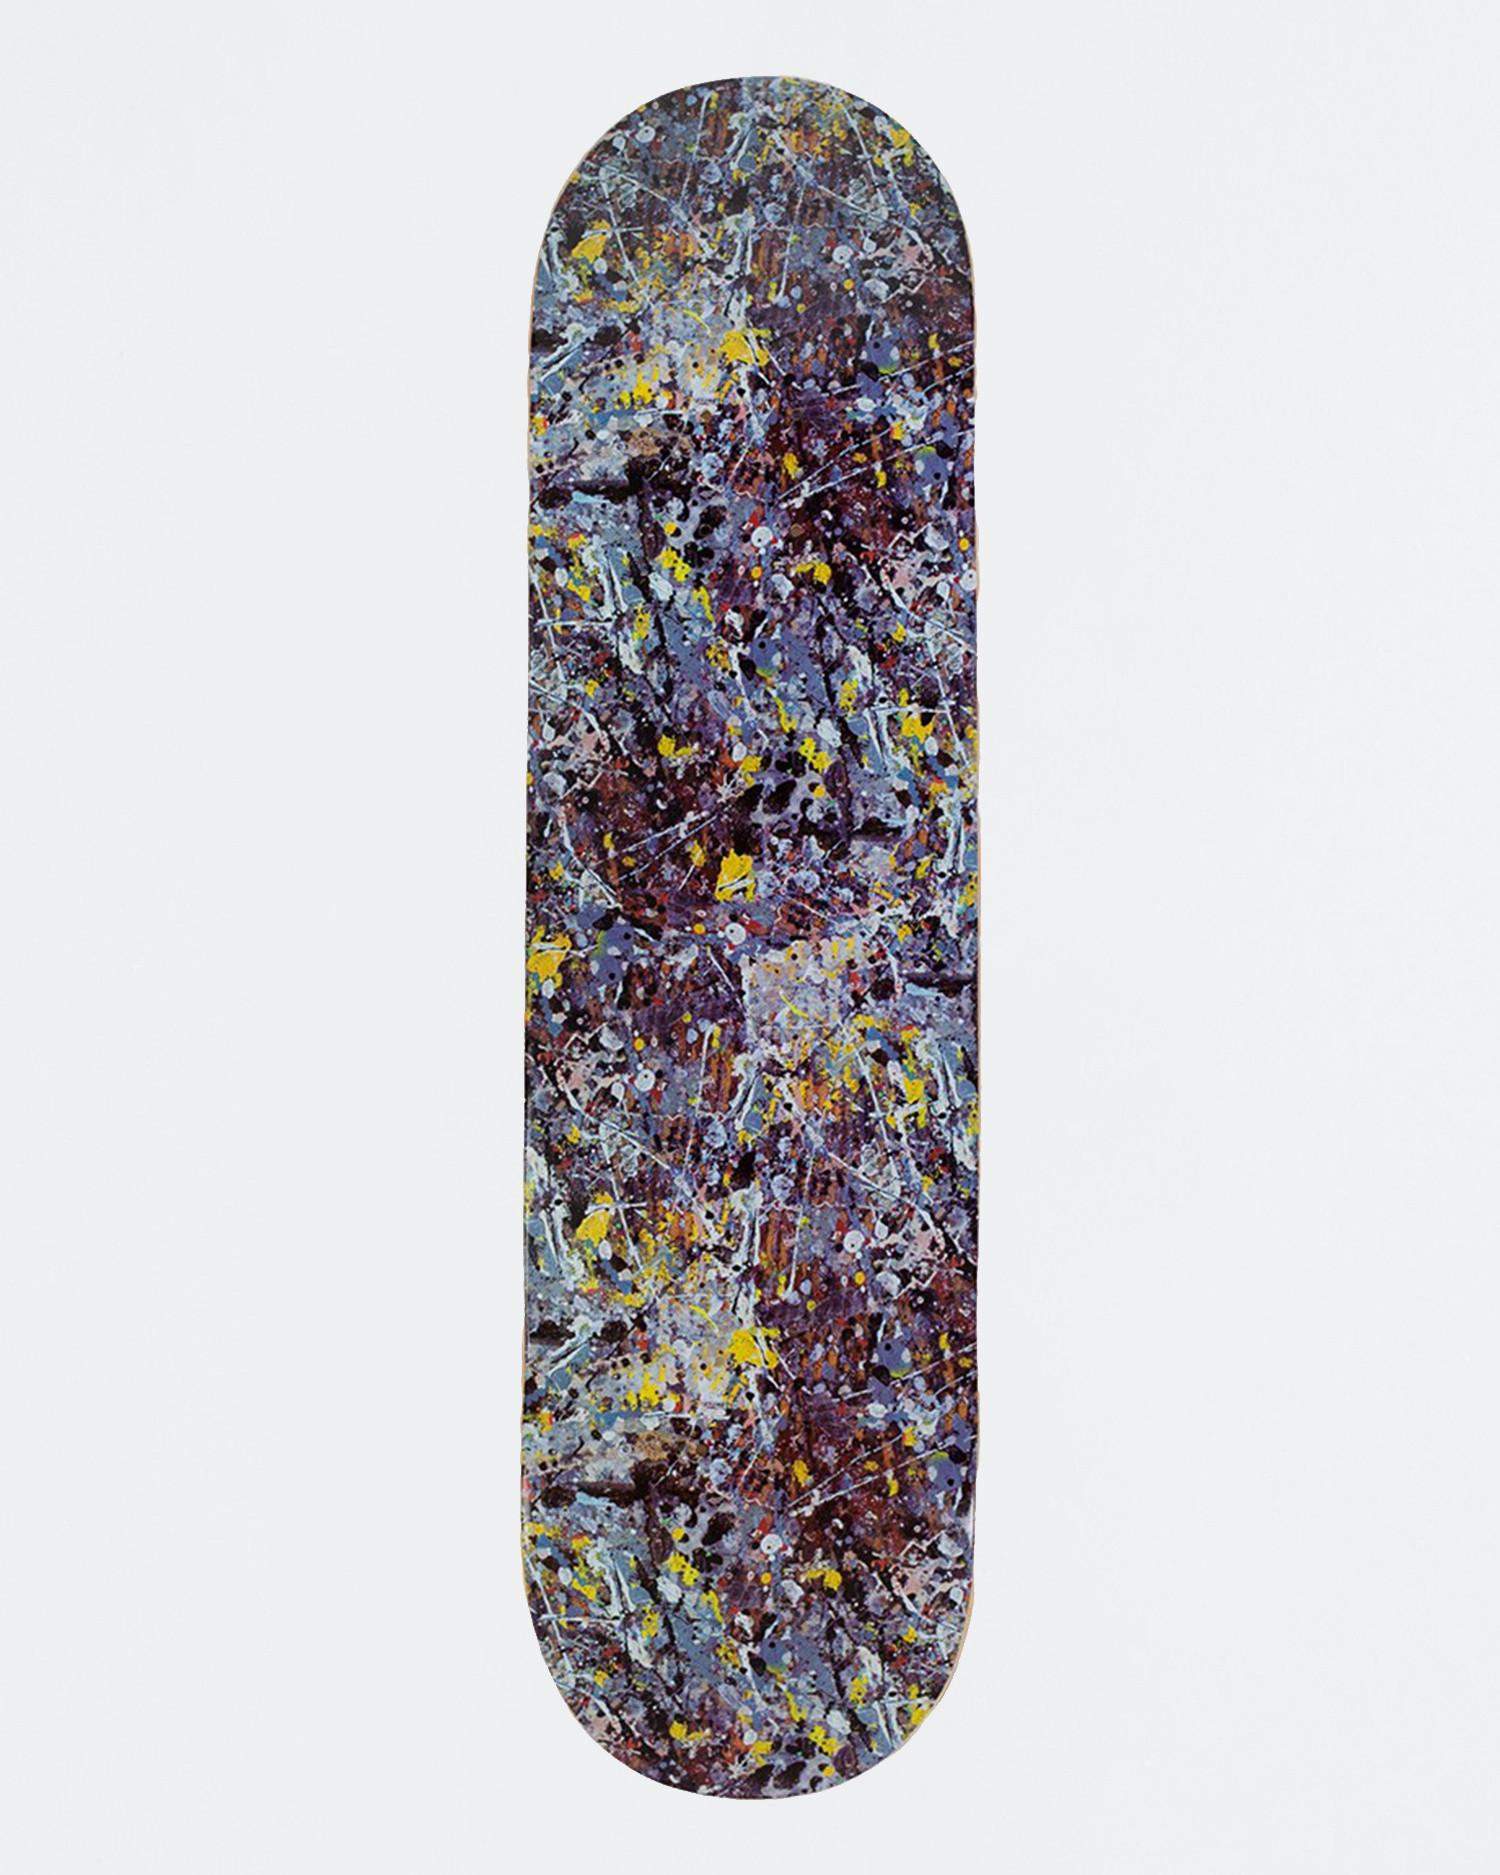 Sync x Jackson Pollock Studio Deck